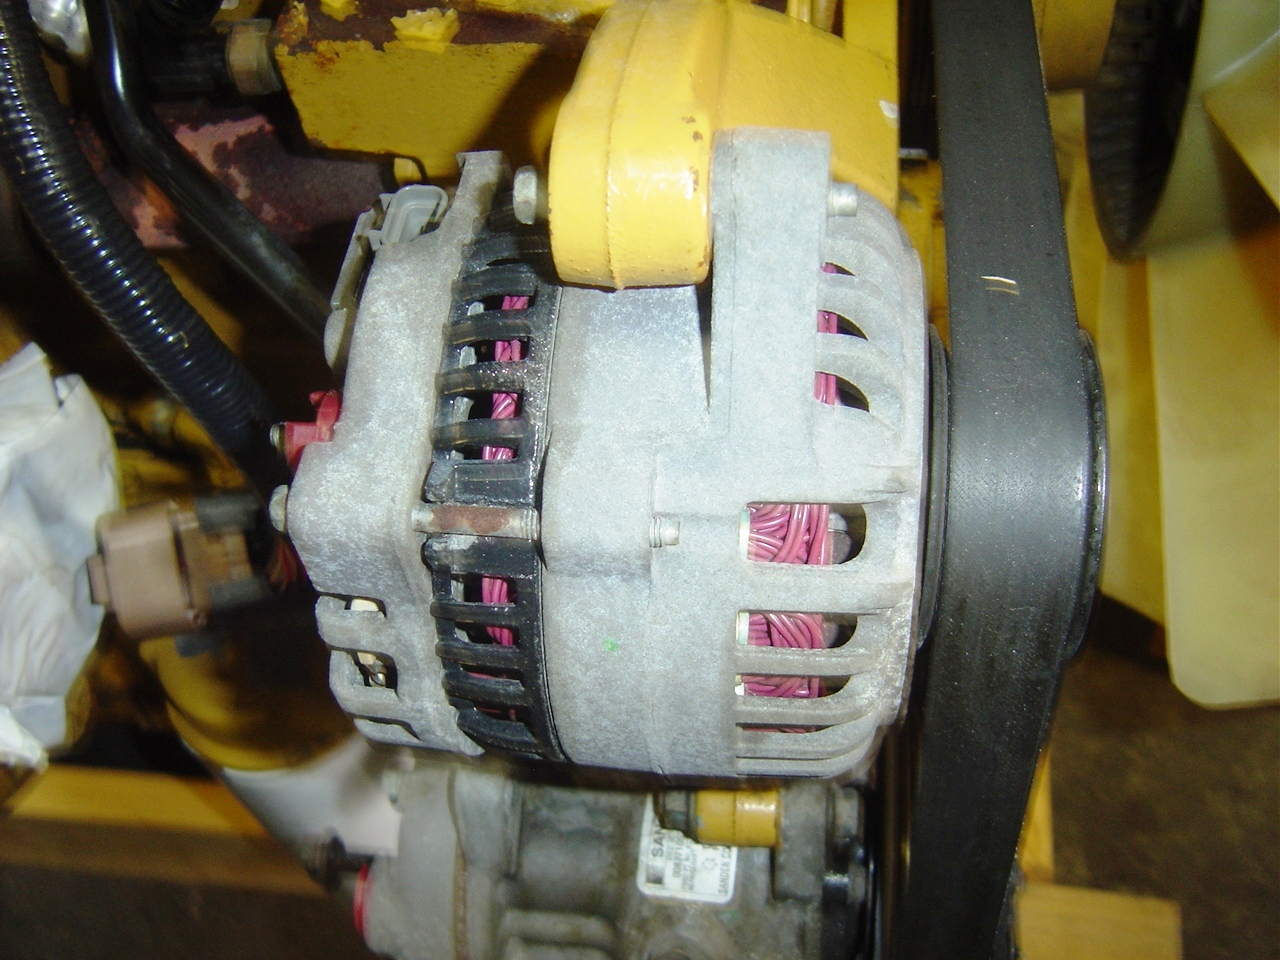 Cat 3126 Alternator Star Coin Guide Gw2 3116 Wiring Diagram Caterpillar Engine As Well C7 Fuel Pressure Sensor Raw Water